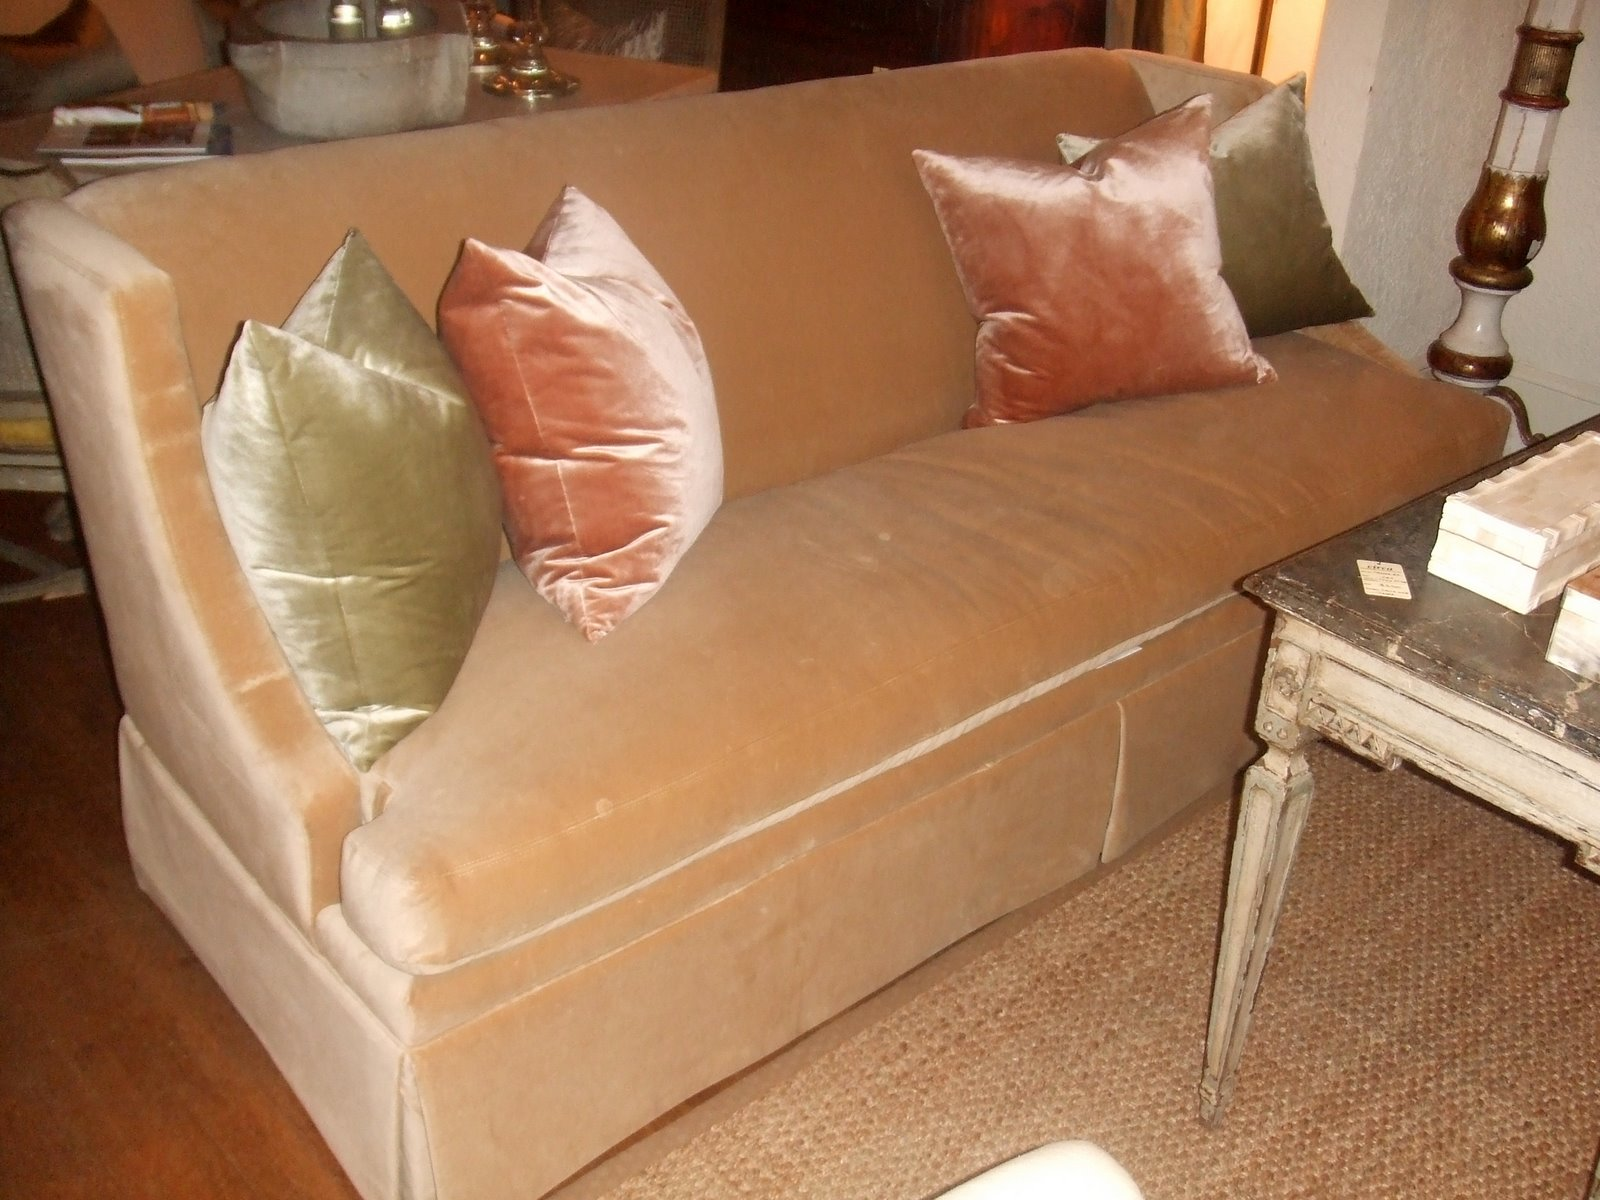 new lee industries arrivals - Lee Industries Sofa